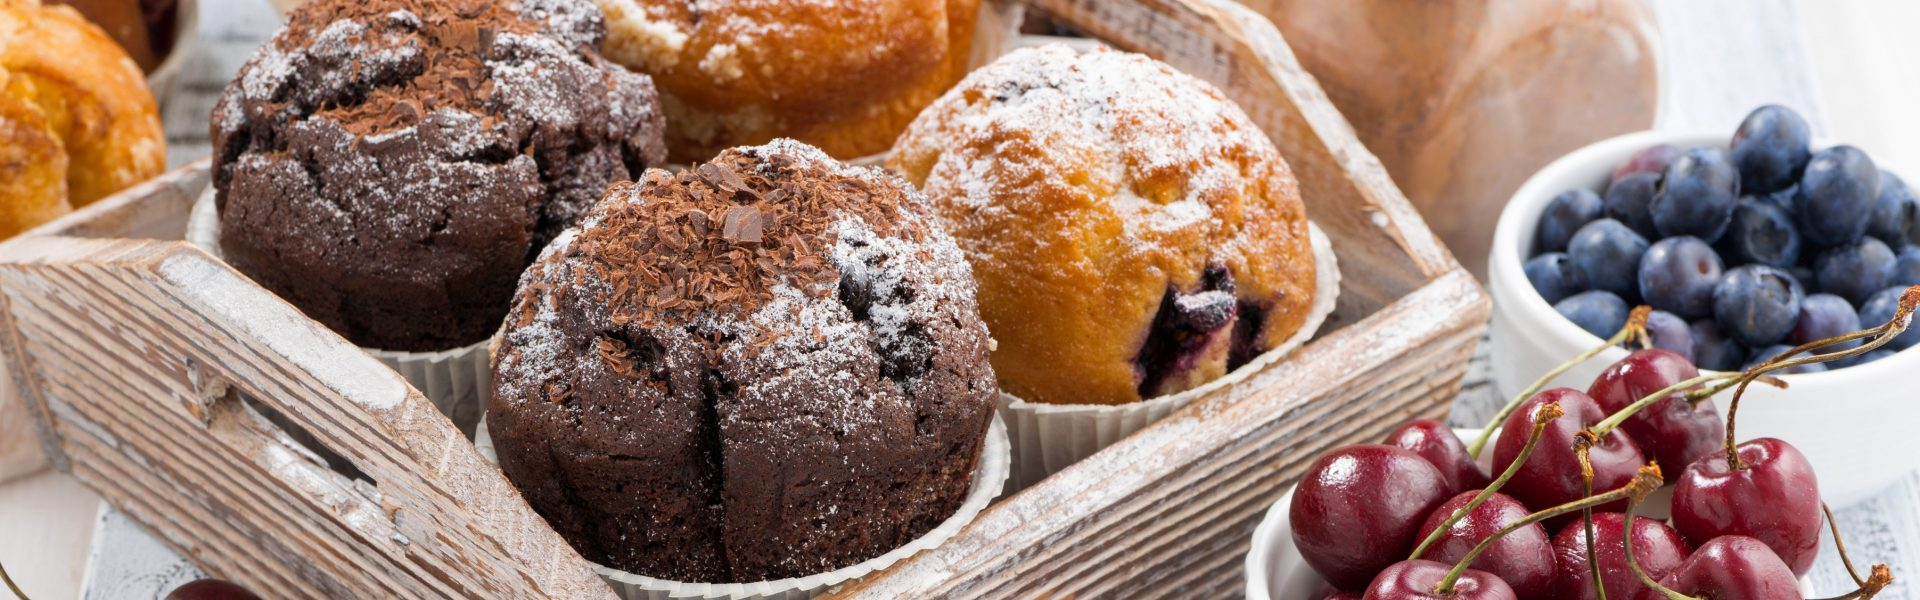 Muffin: Malý dortík a velká radost!